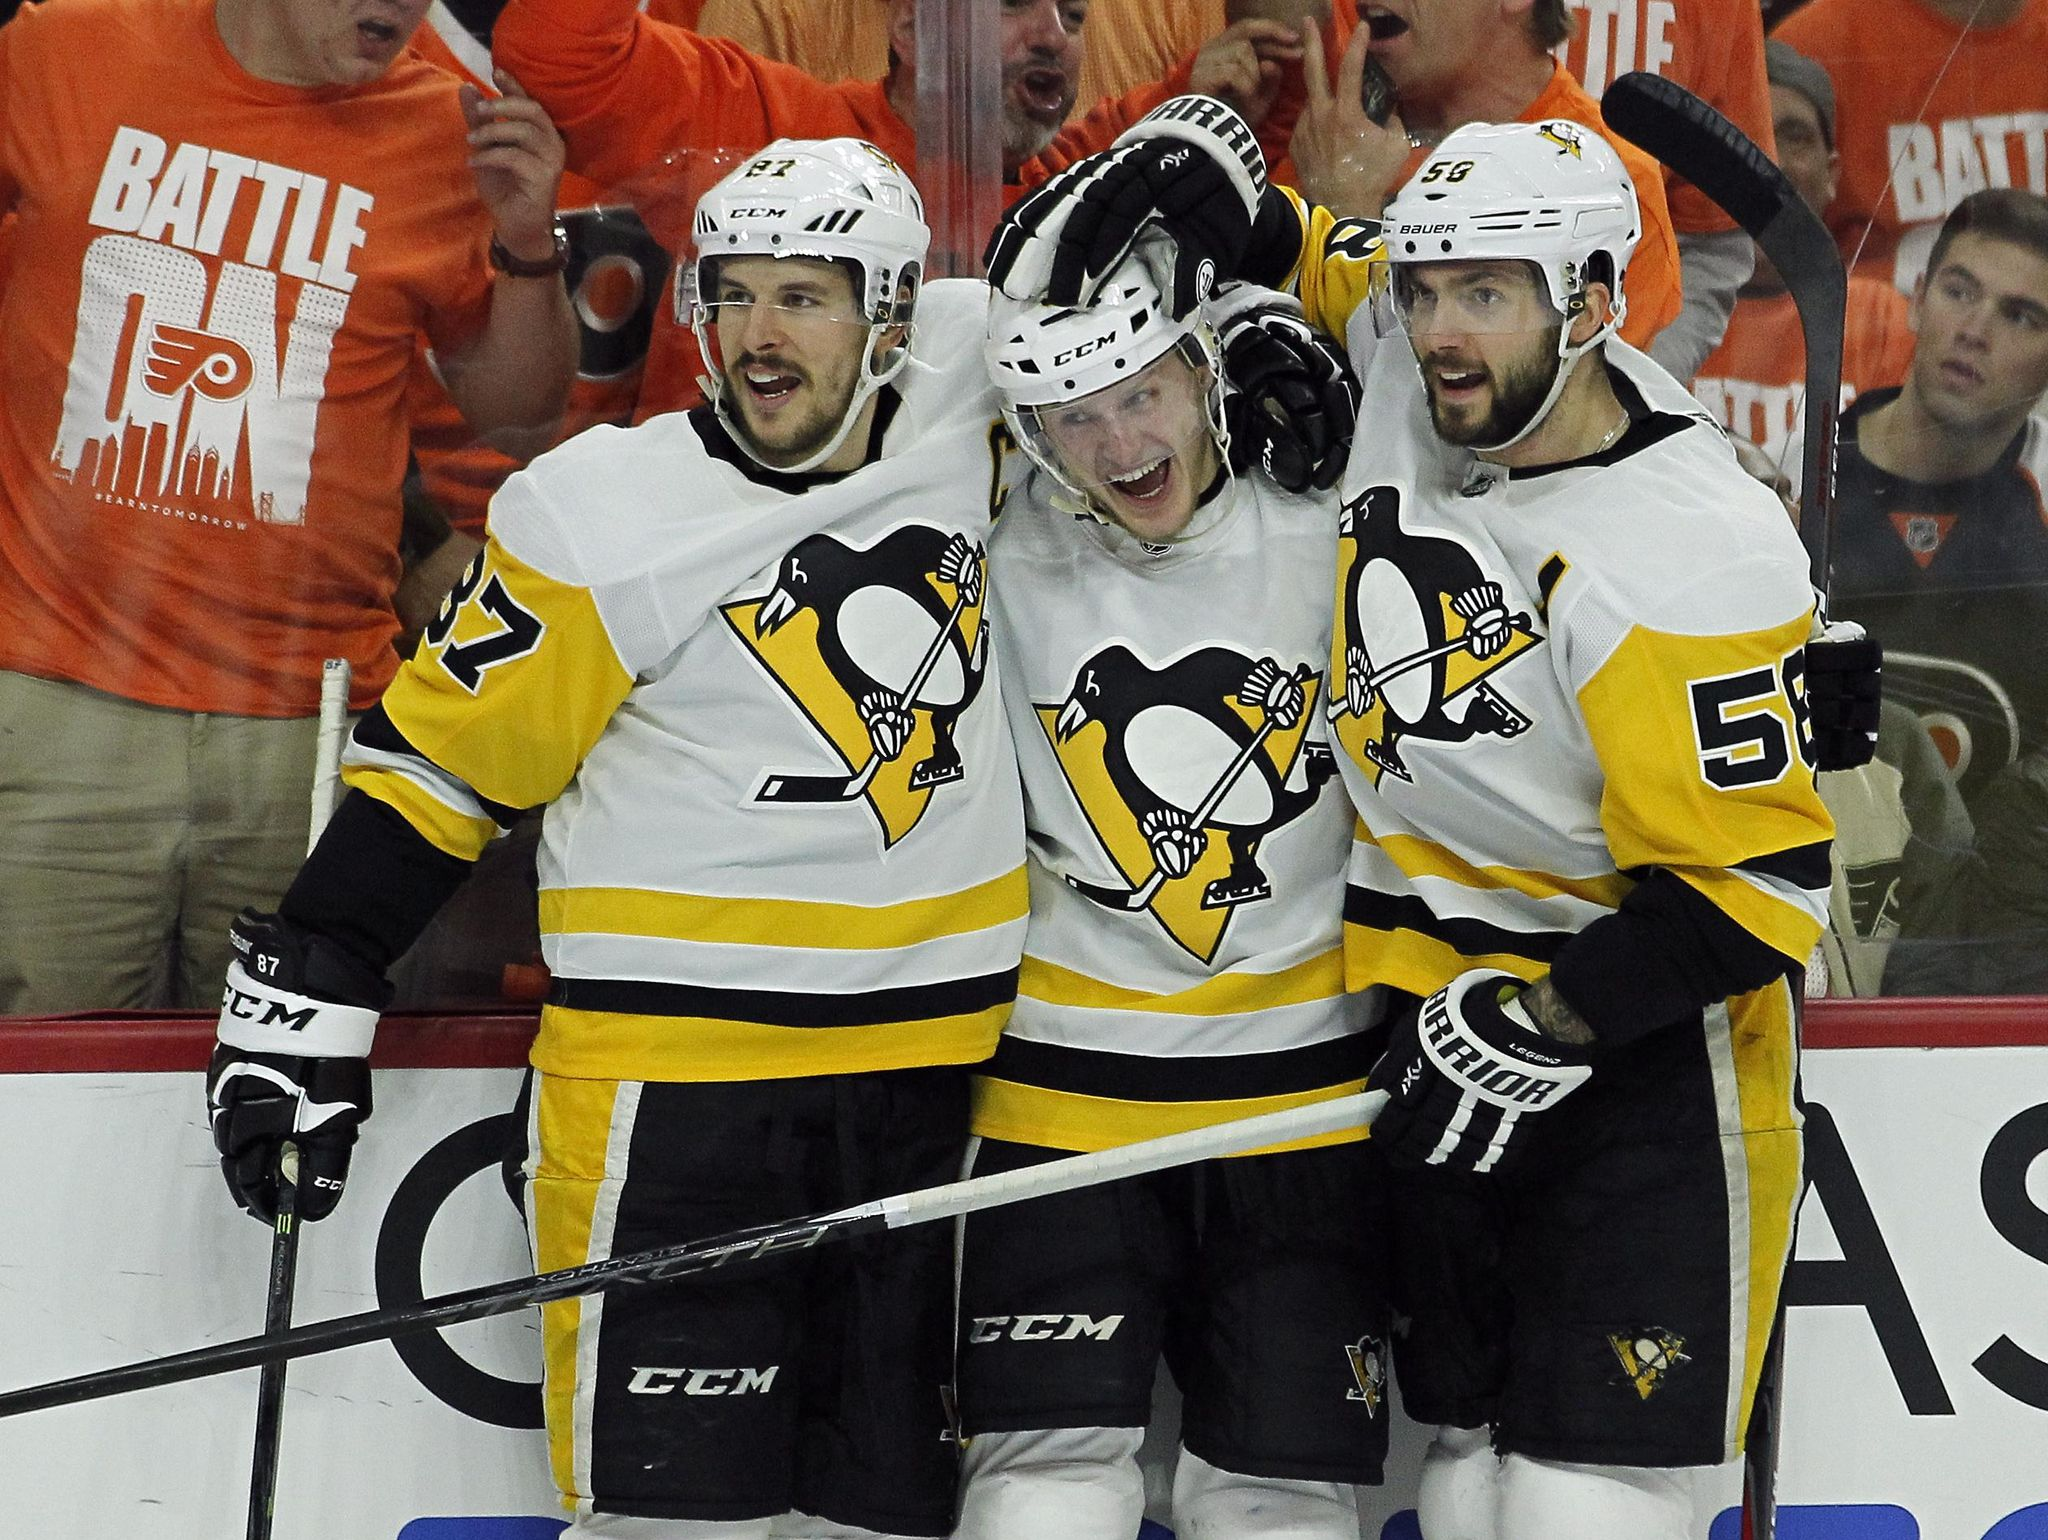 Penguins_flyers_hockey_45708_s2048x1540